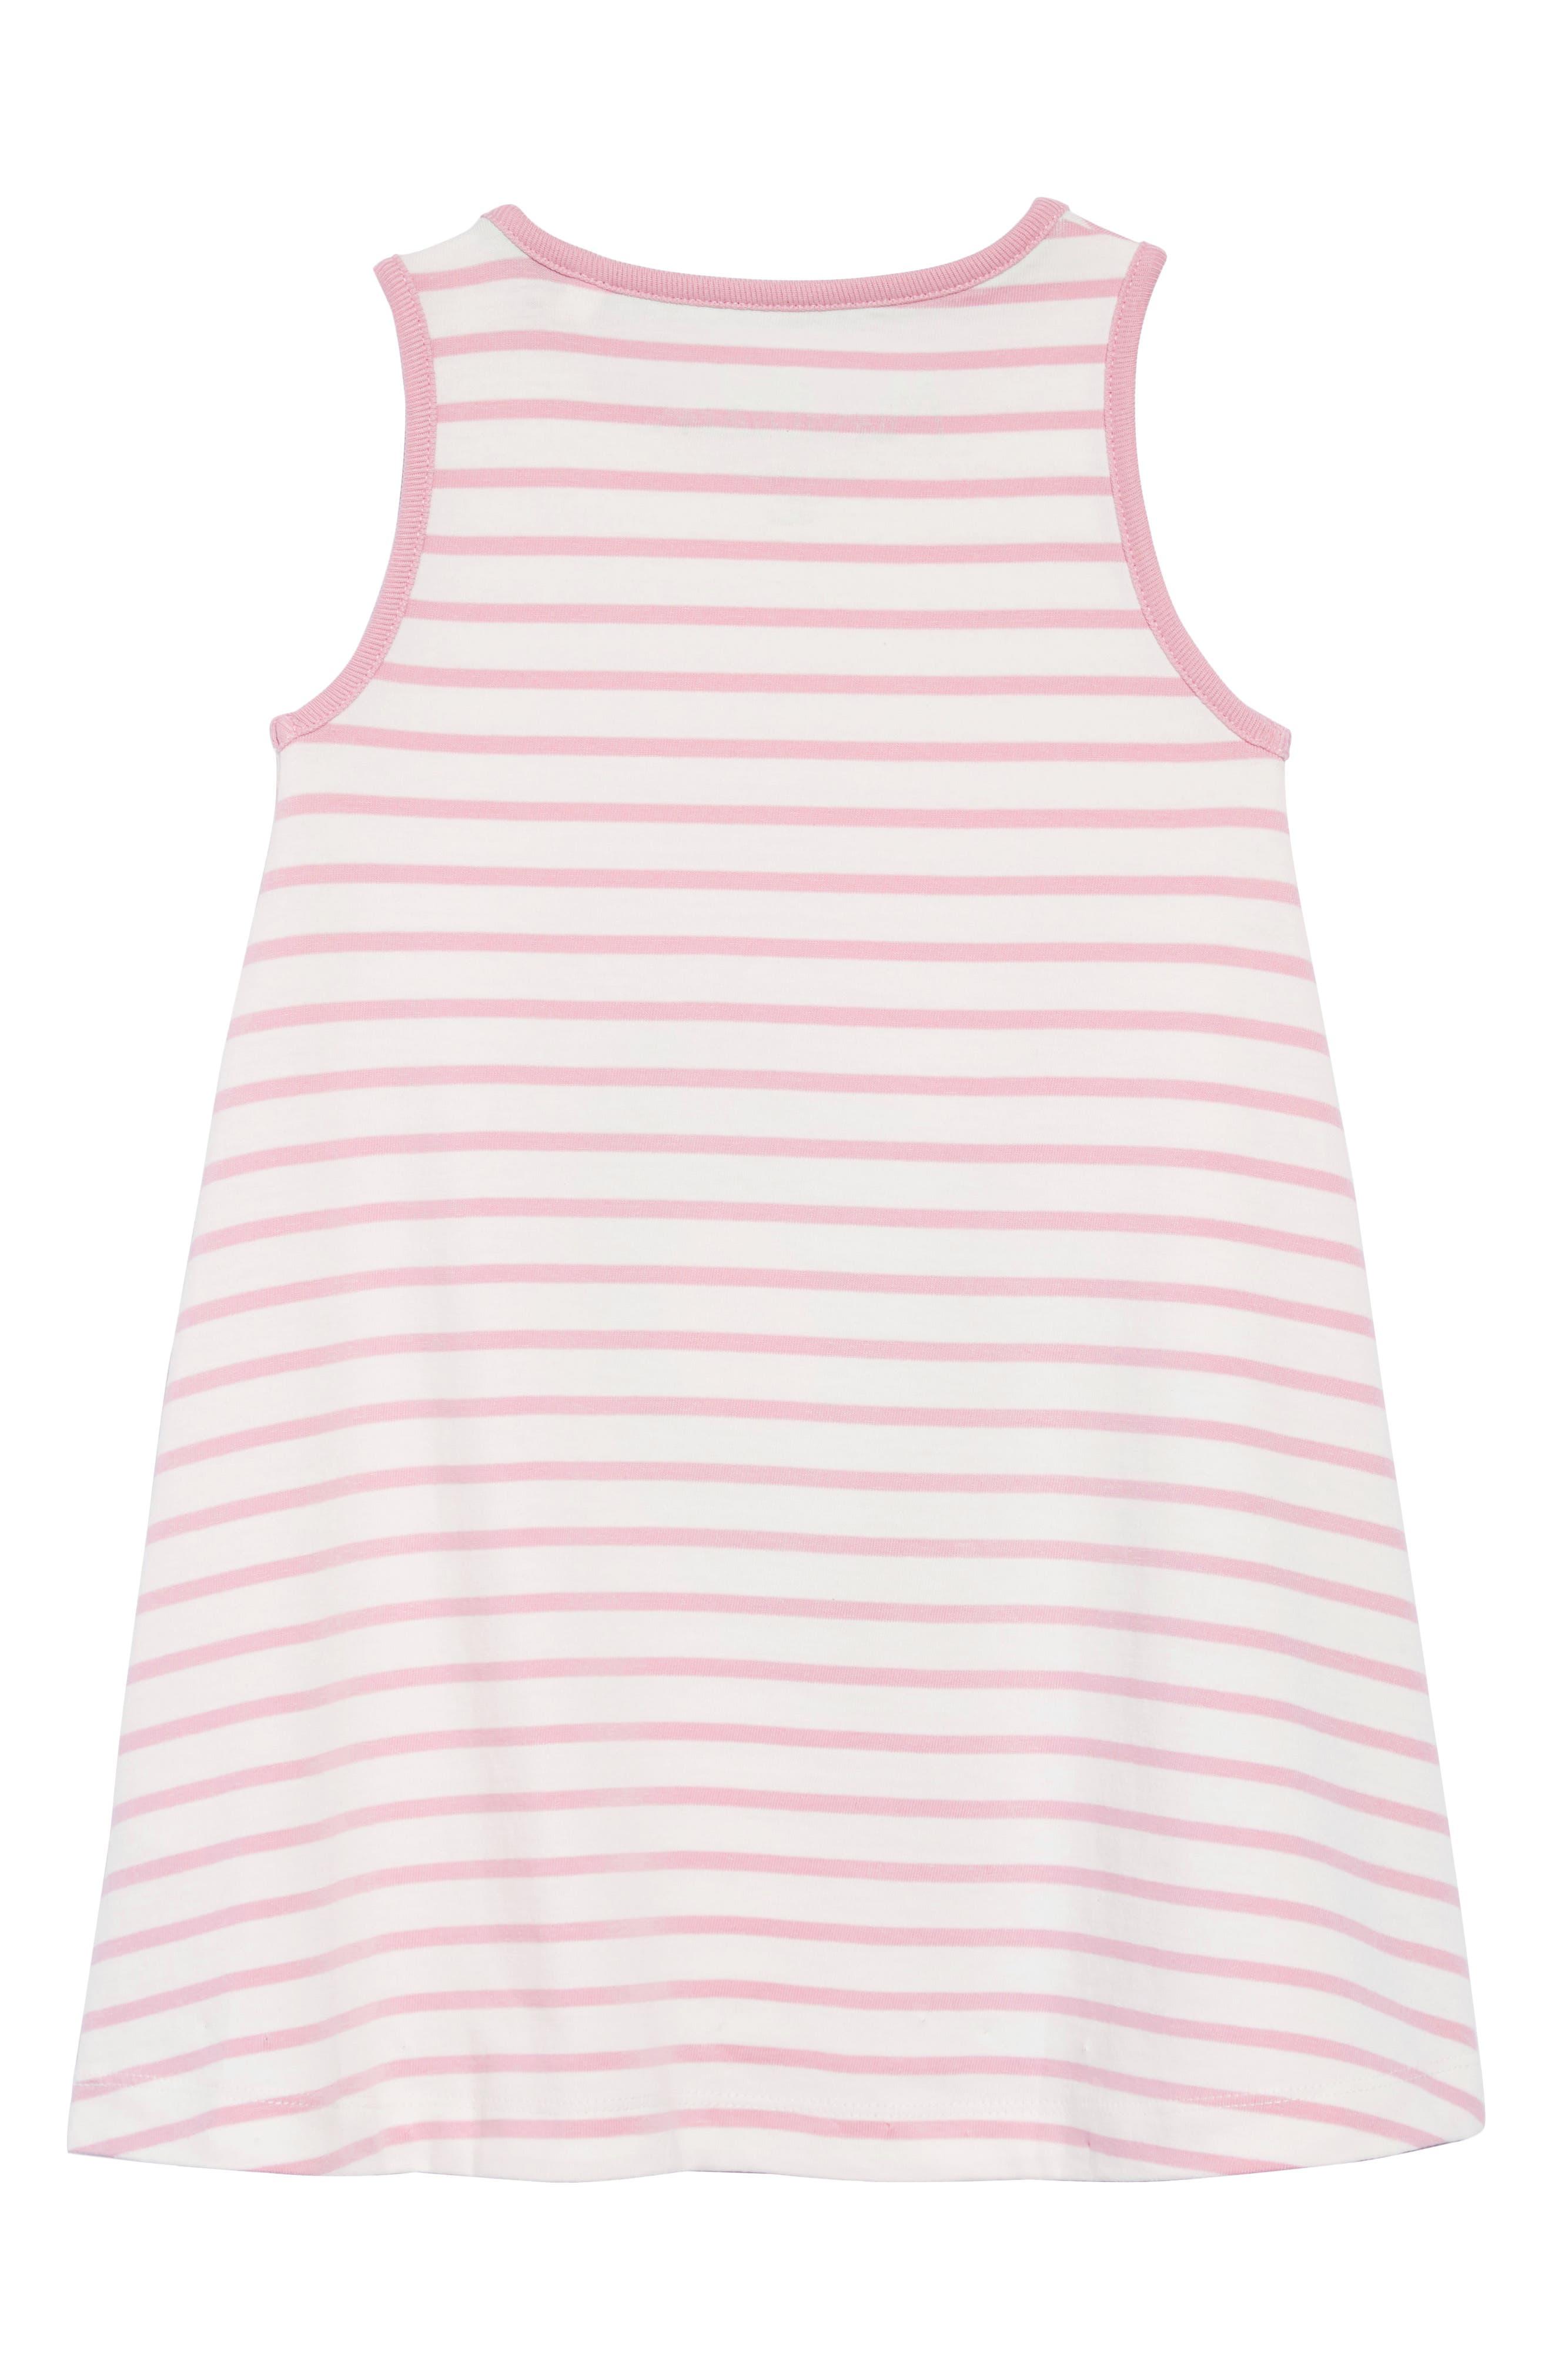 Vacation Appliqué Dress,                             Alternate thumbnail 2, color,                             Ivory/ Rosebud Stripe